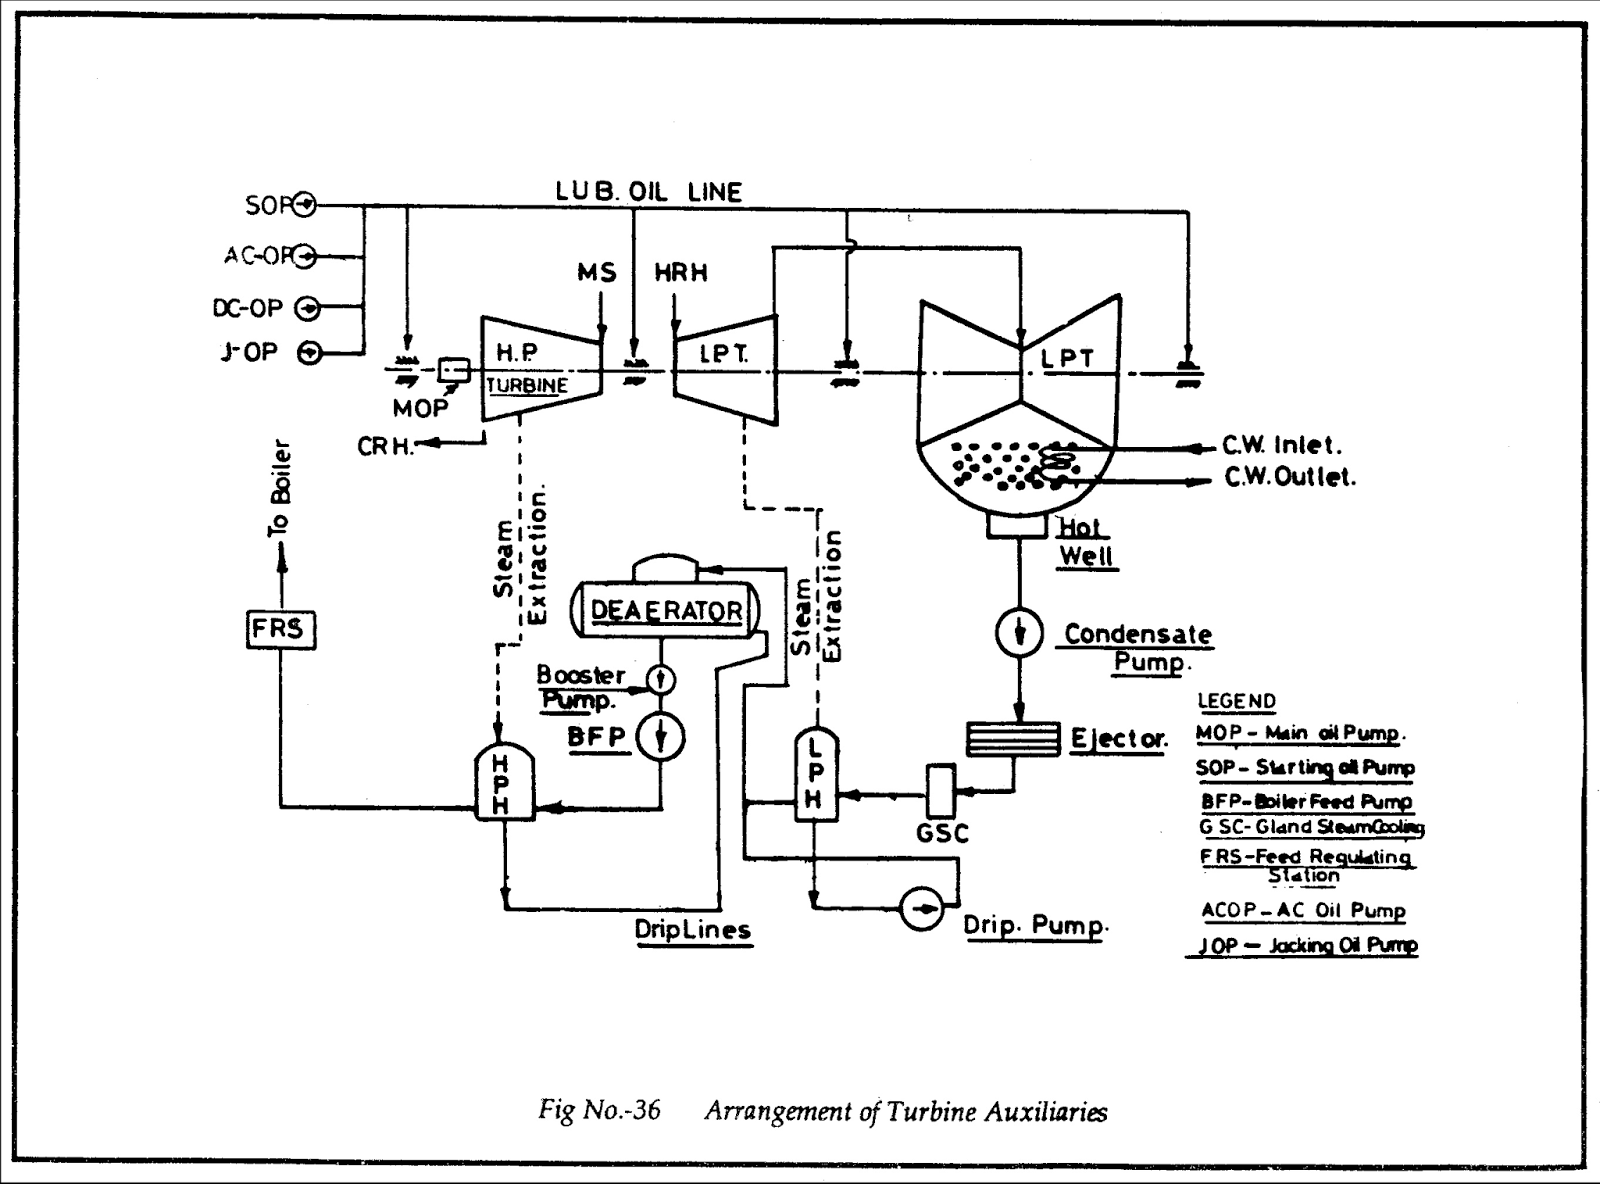 solar power plant diagram pdf